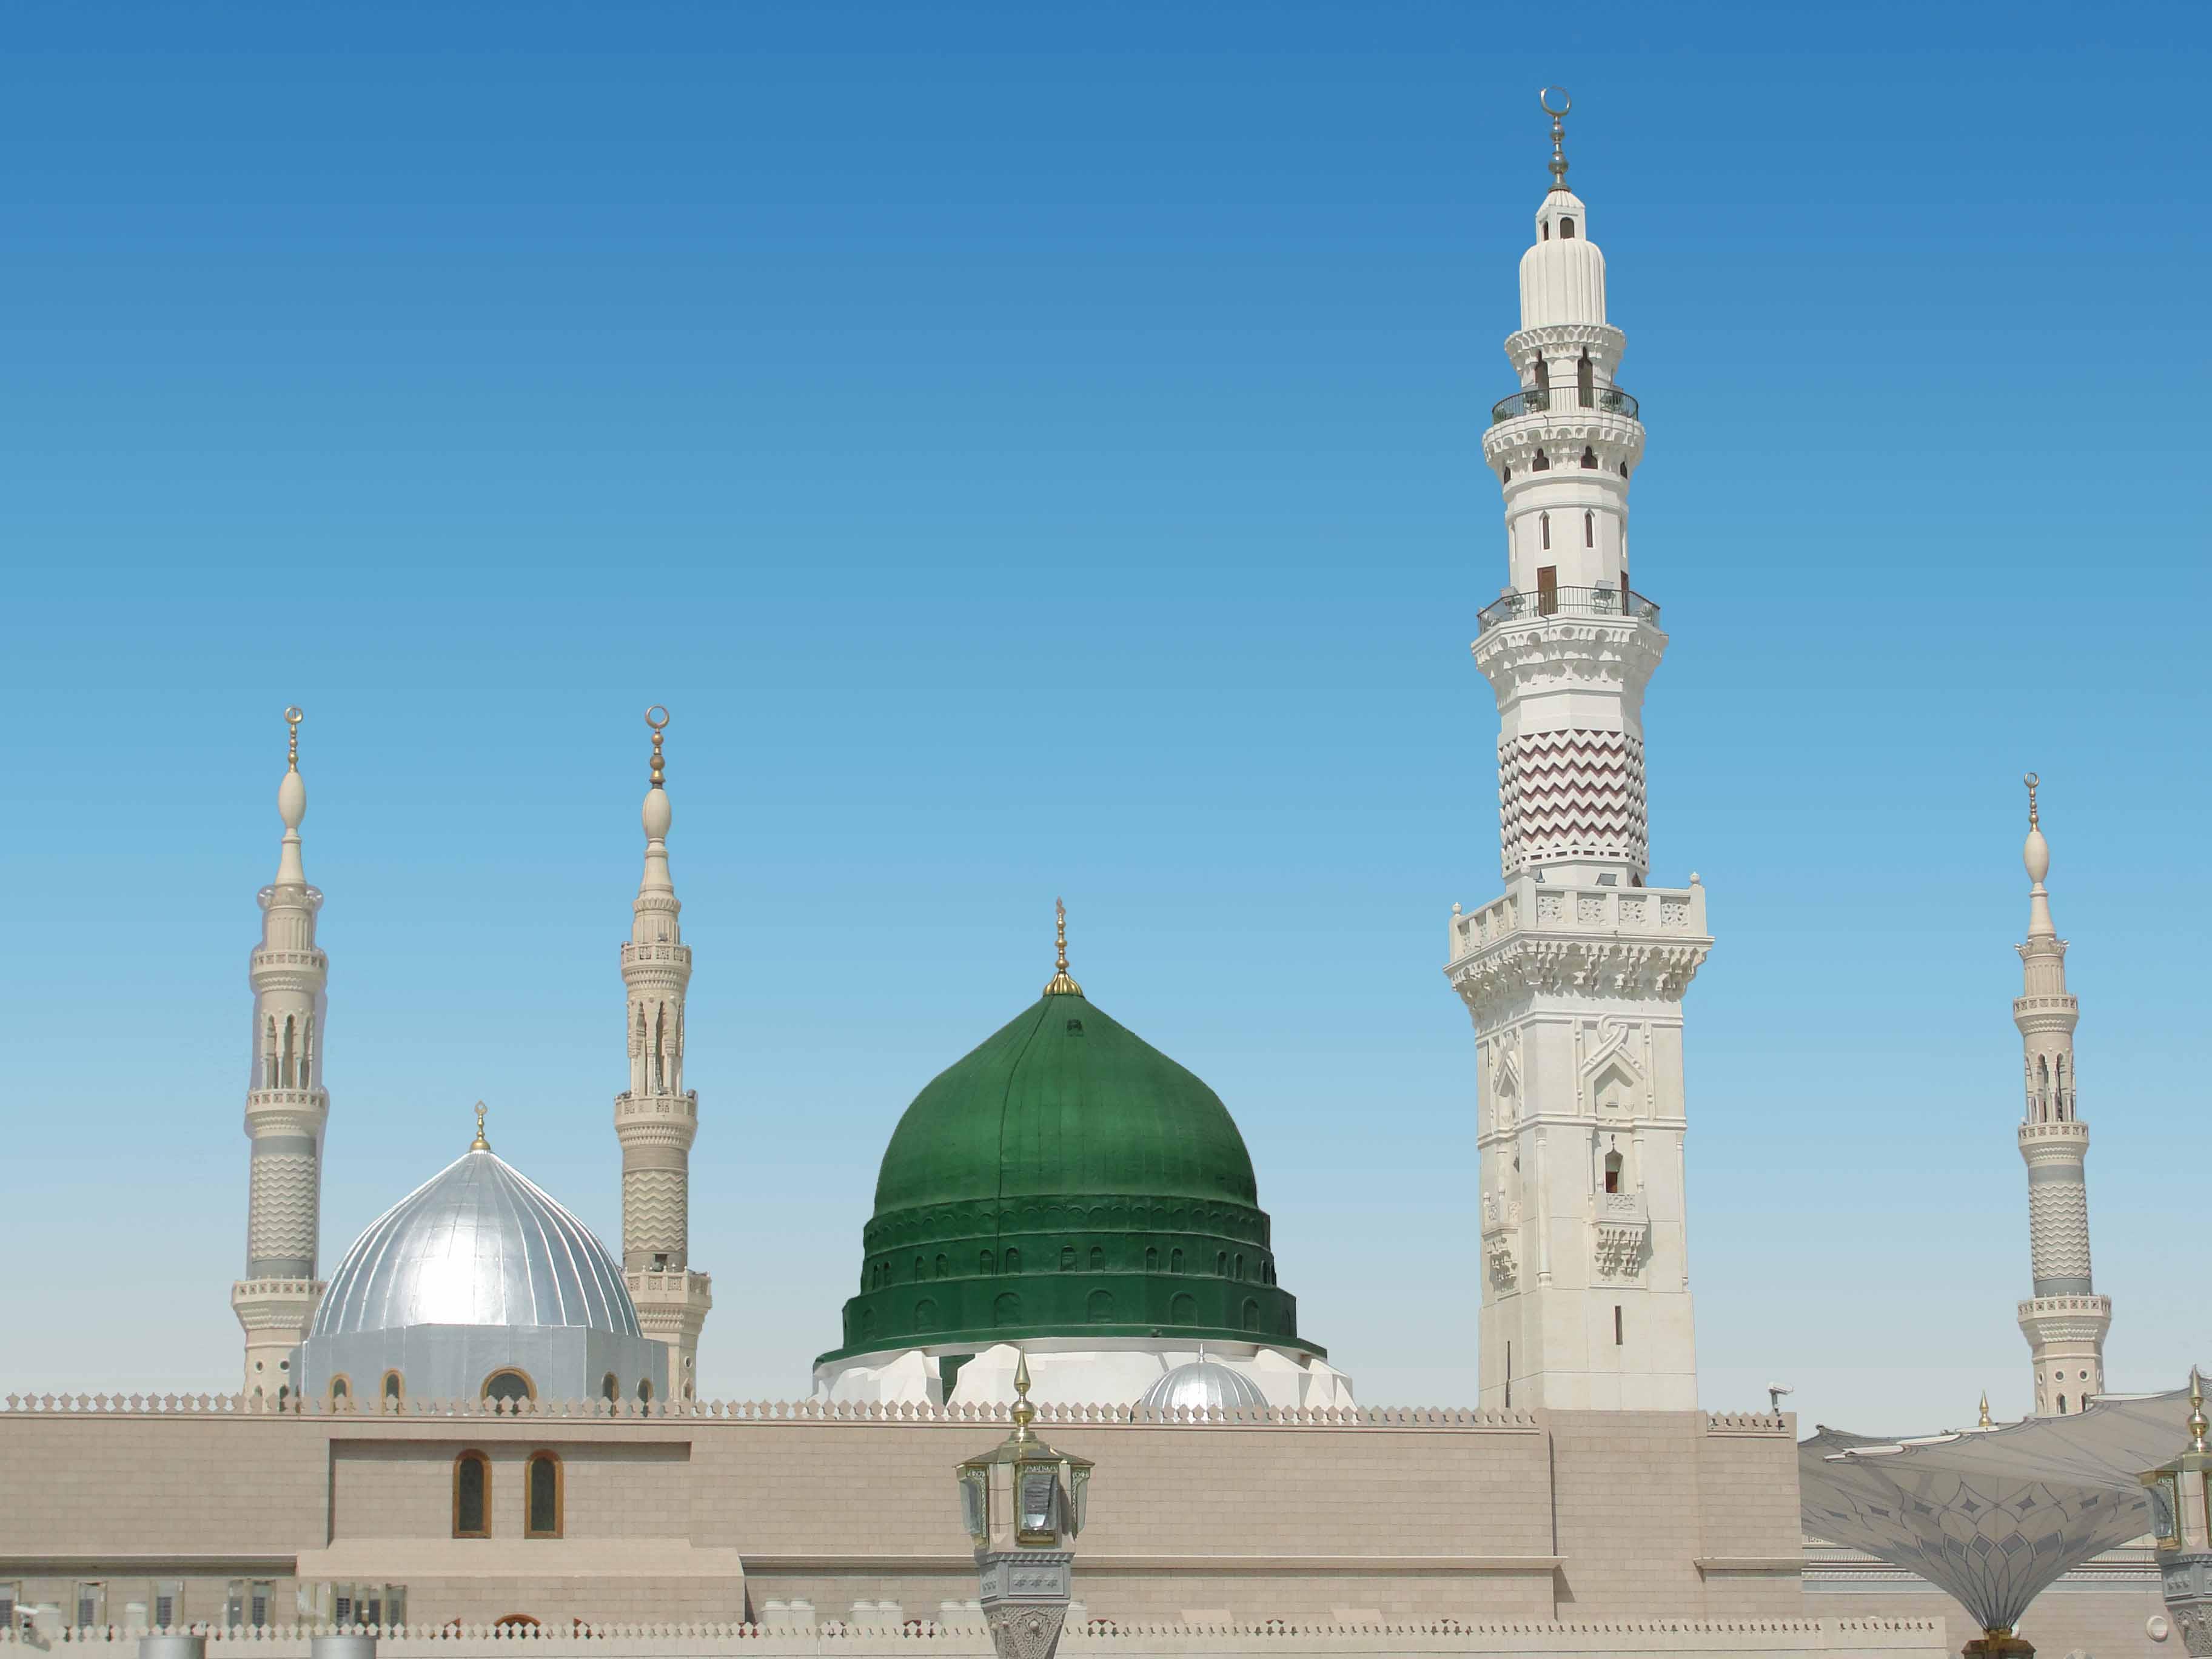 Masjid_Nabawi_25.jpg